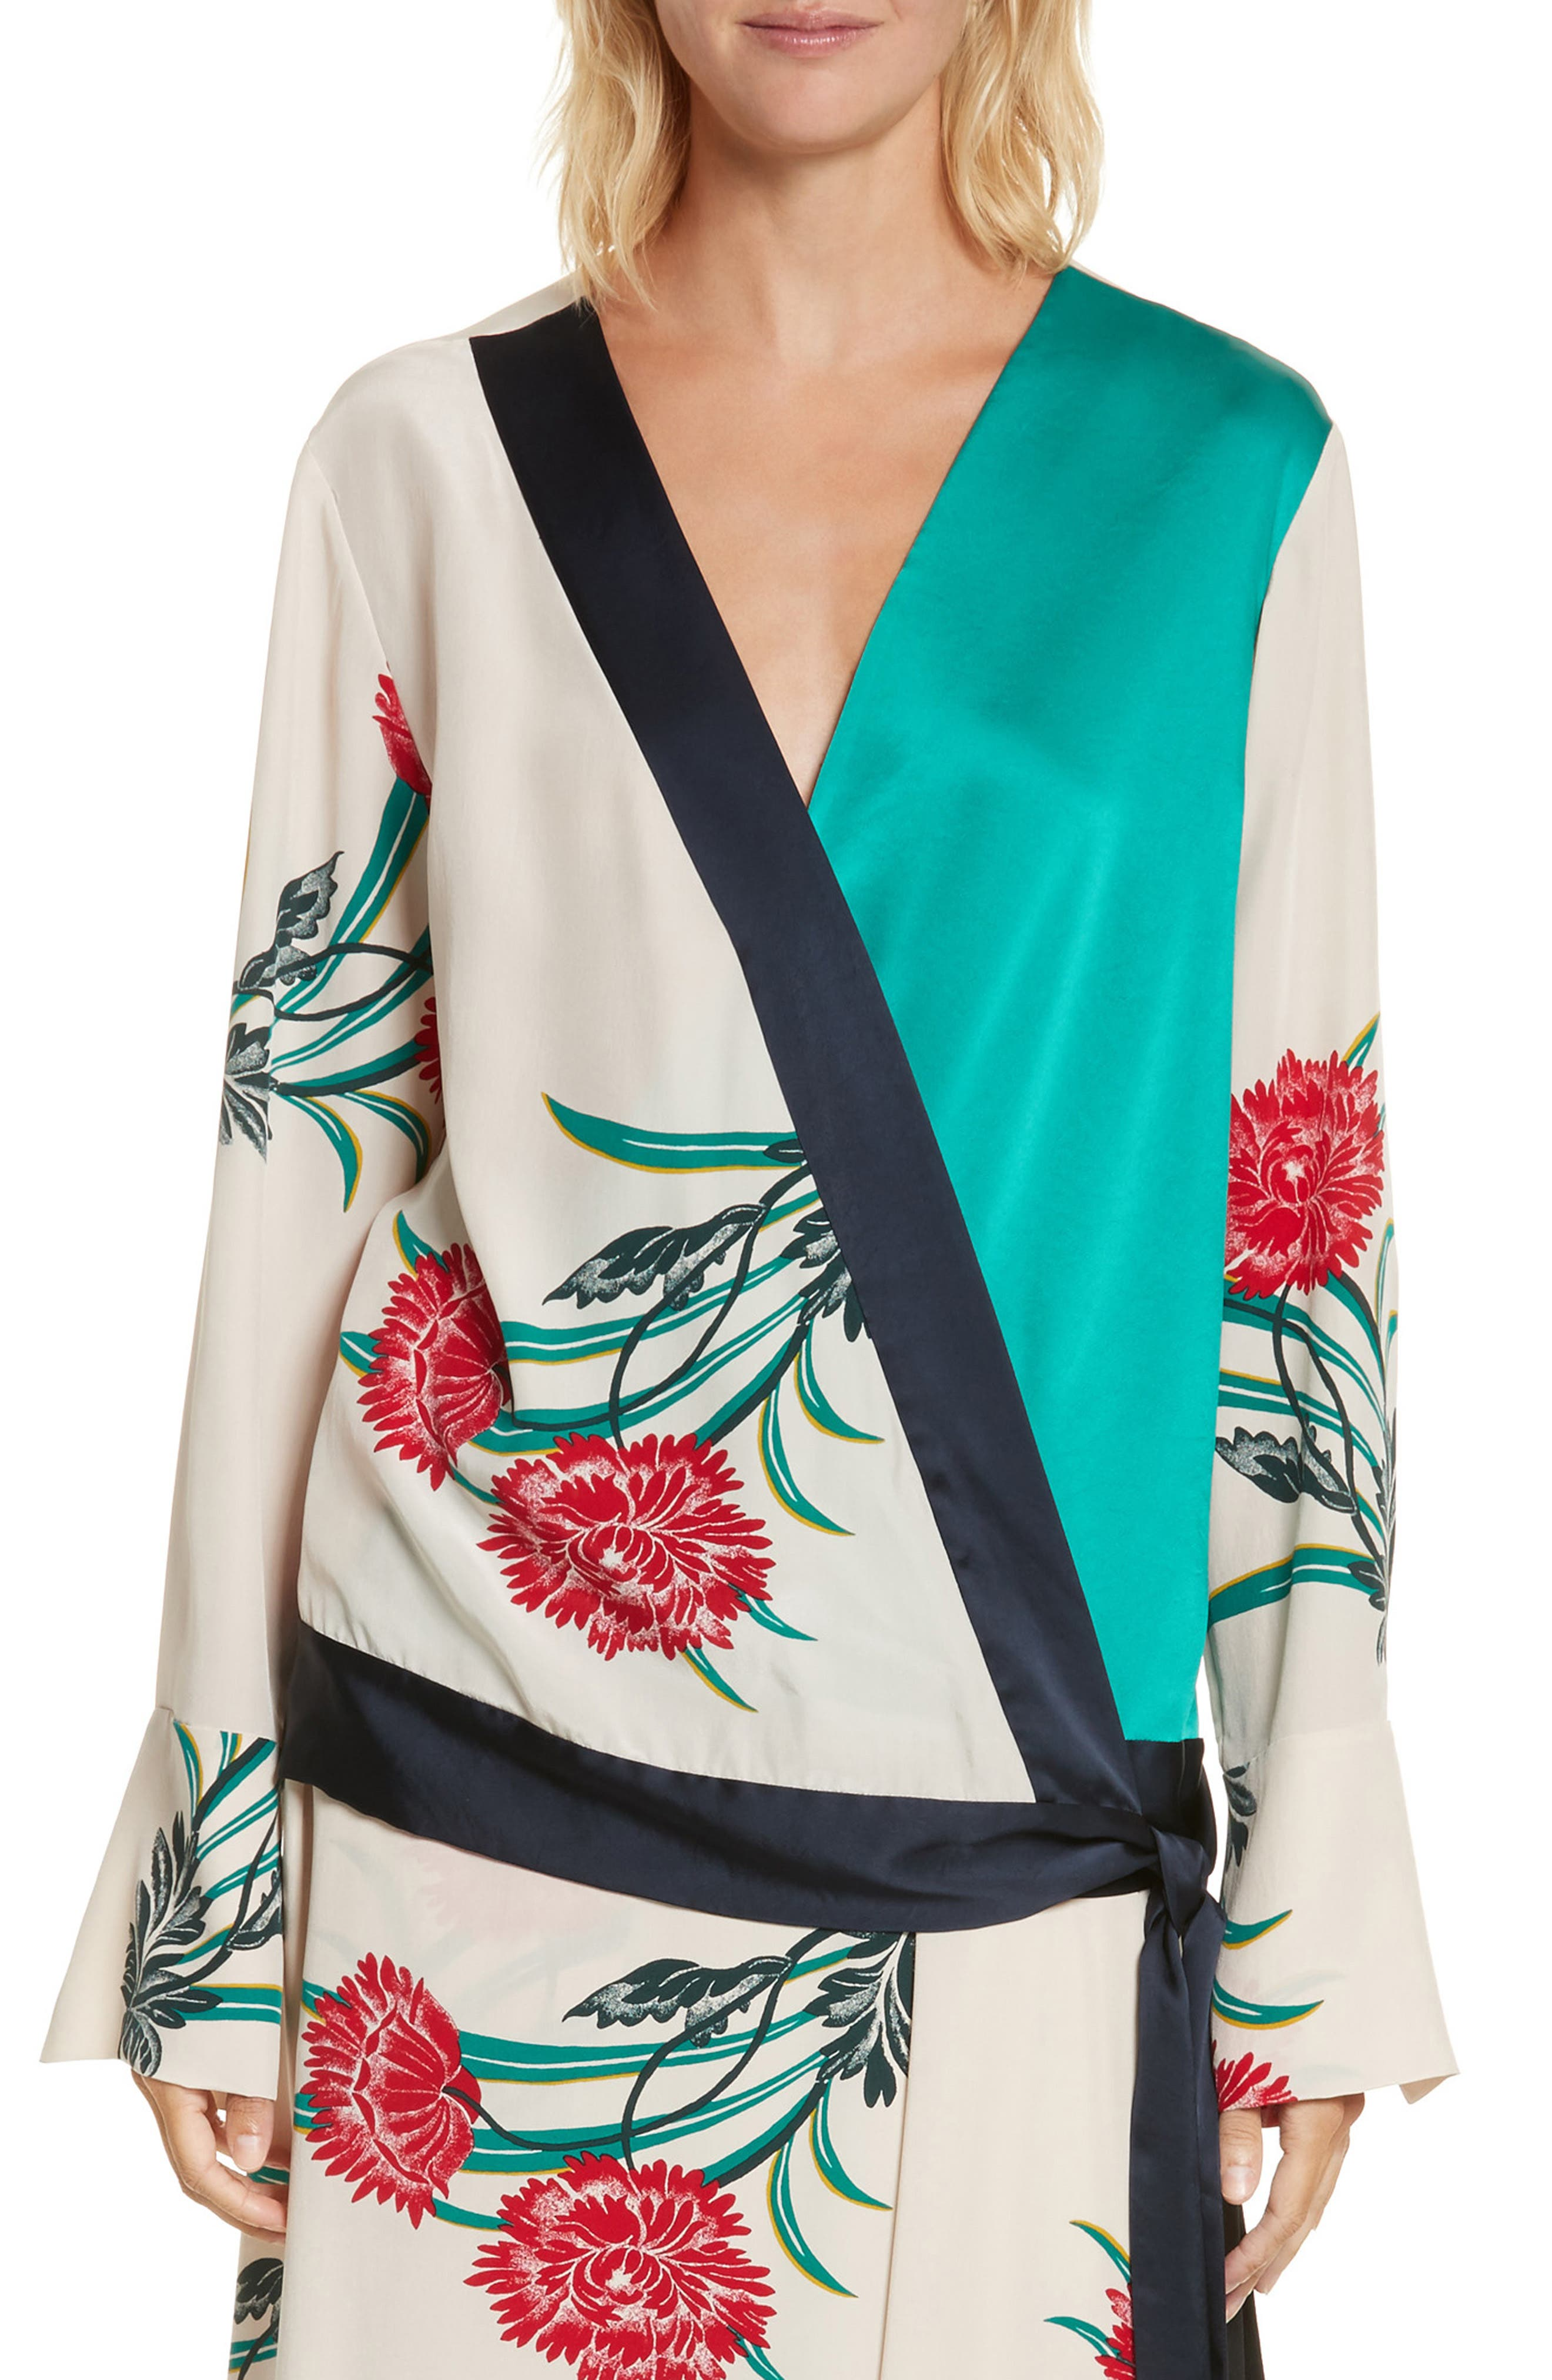 Diane von Furstenberg Bell Sleeve Crossover Silk Blouse,                             Main thumbnail 1, color,                             Farren Pearl/ Alex Navy/ Jade